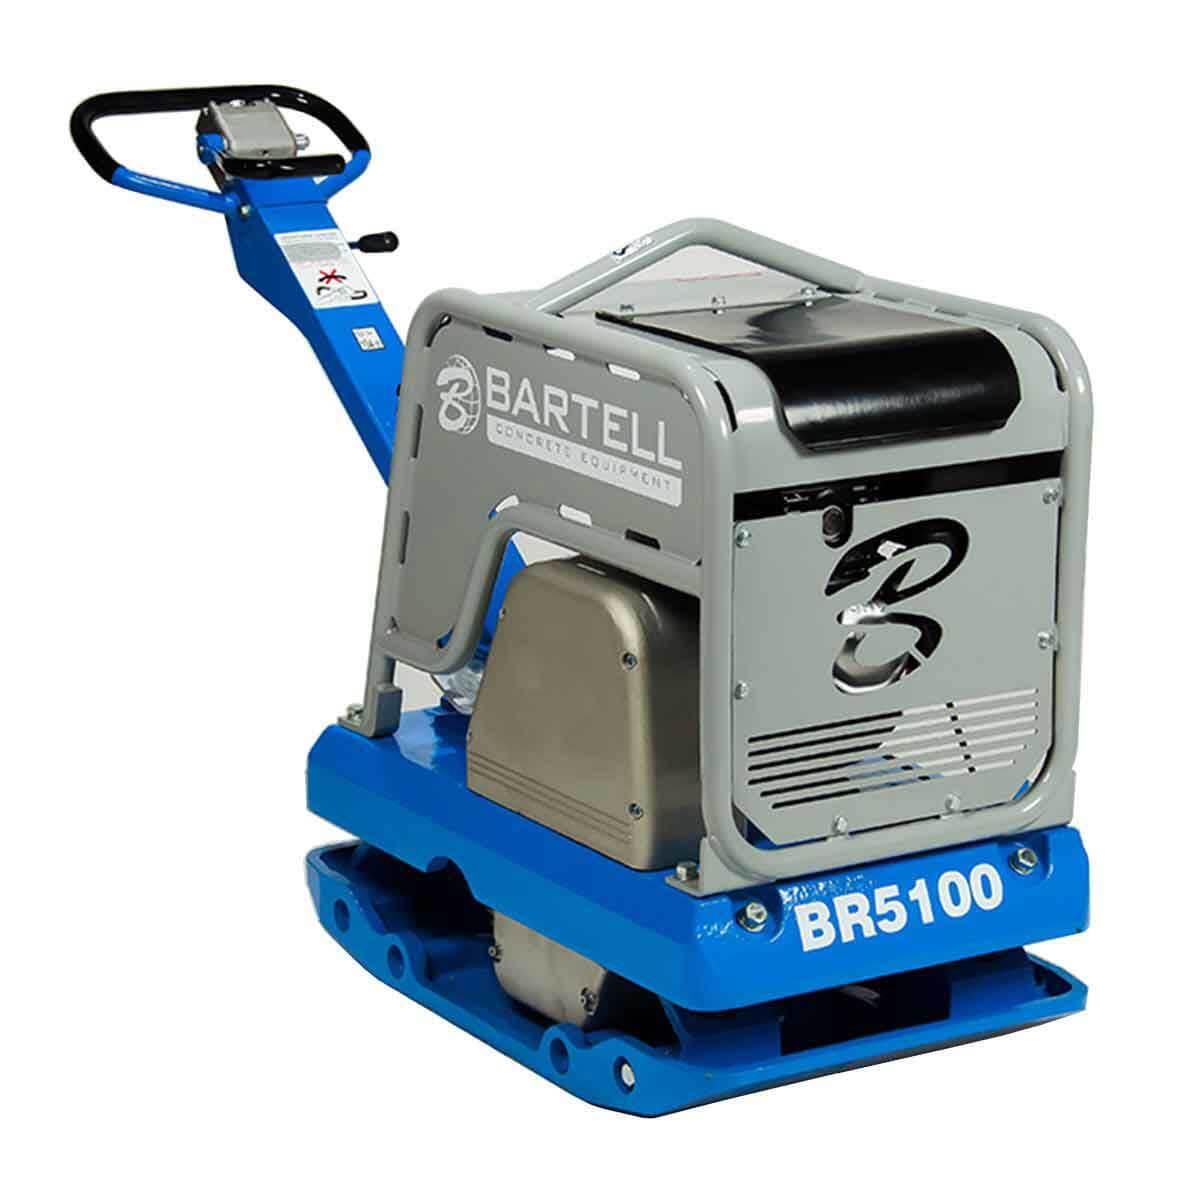 Bartell BR5100 Reversible Plate